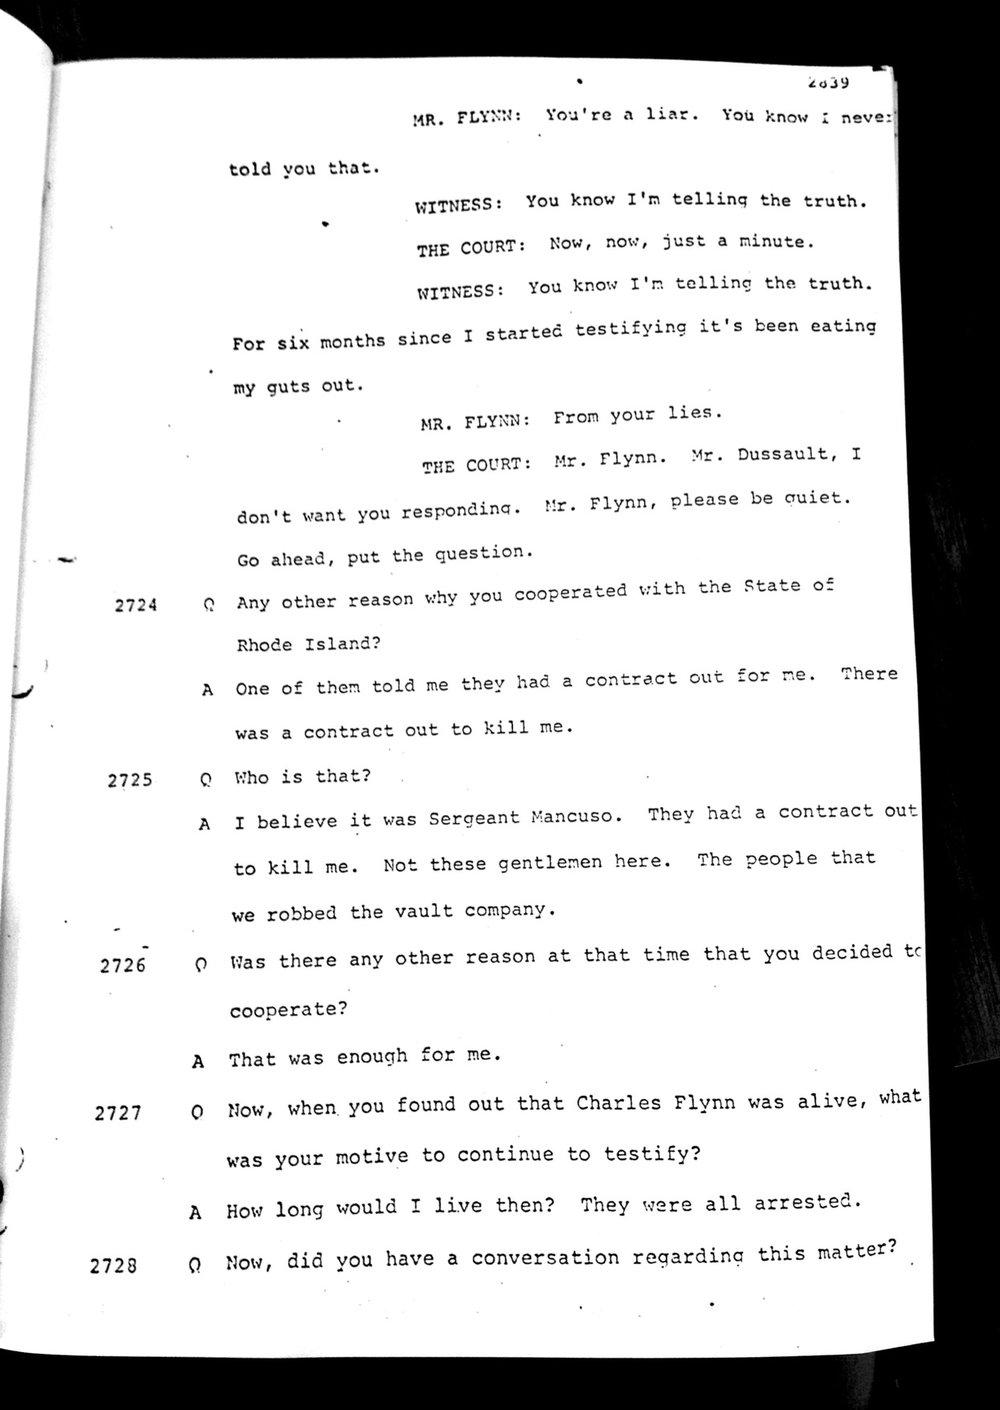 RI vs Ralph Byrnes 1 pg 166_Chucky_Dussaultpdf.jpg